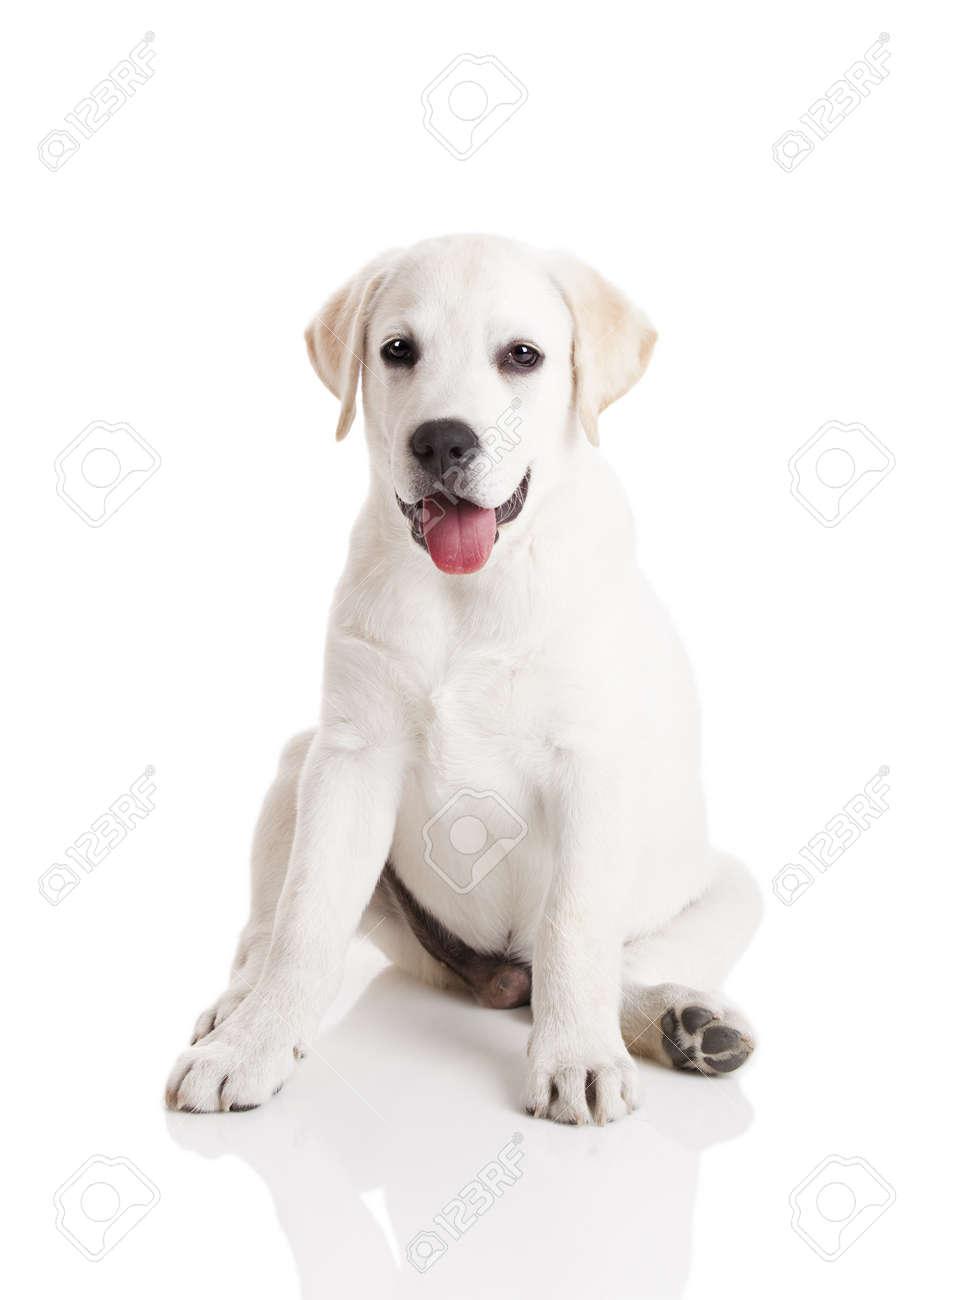 Beautiful labrador retriever cream puppy isolated on white background Stock Photo - 11130830